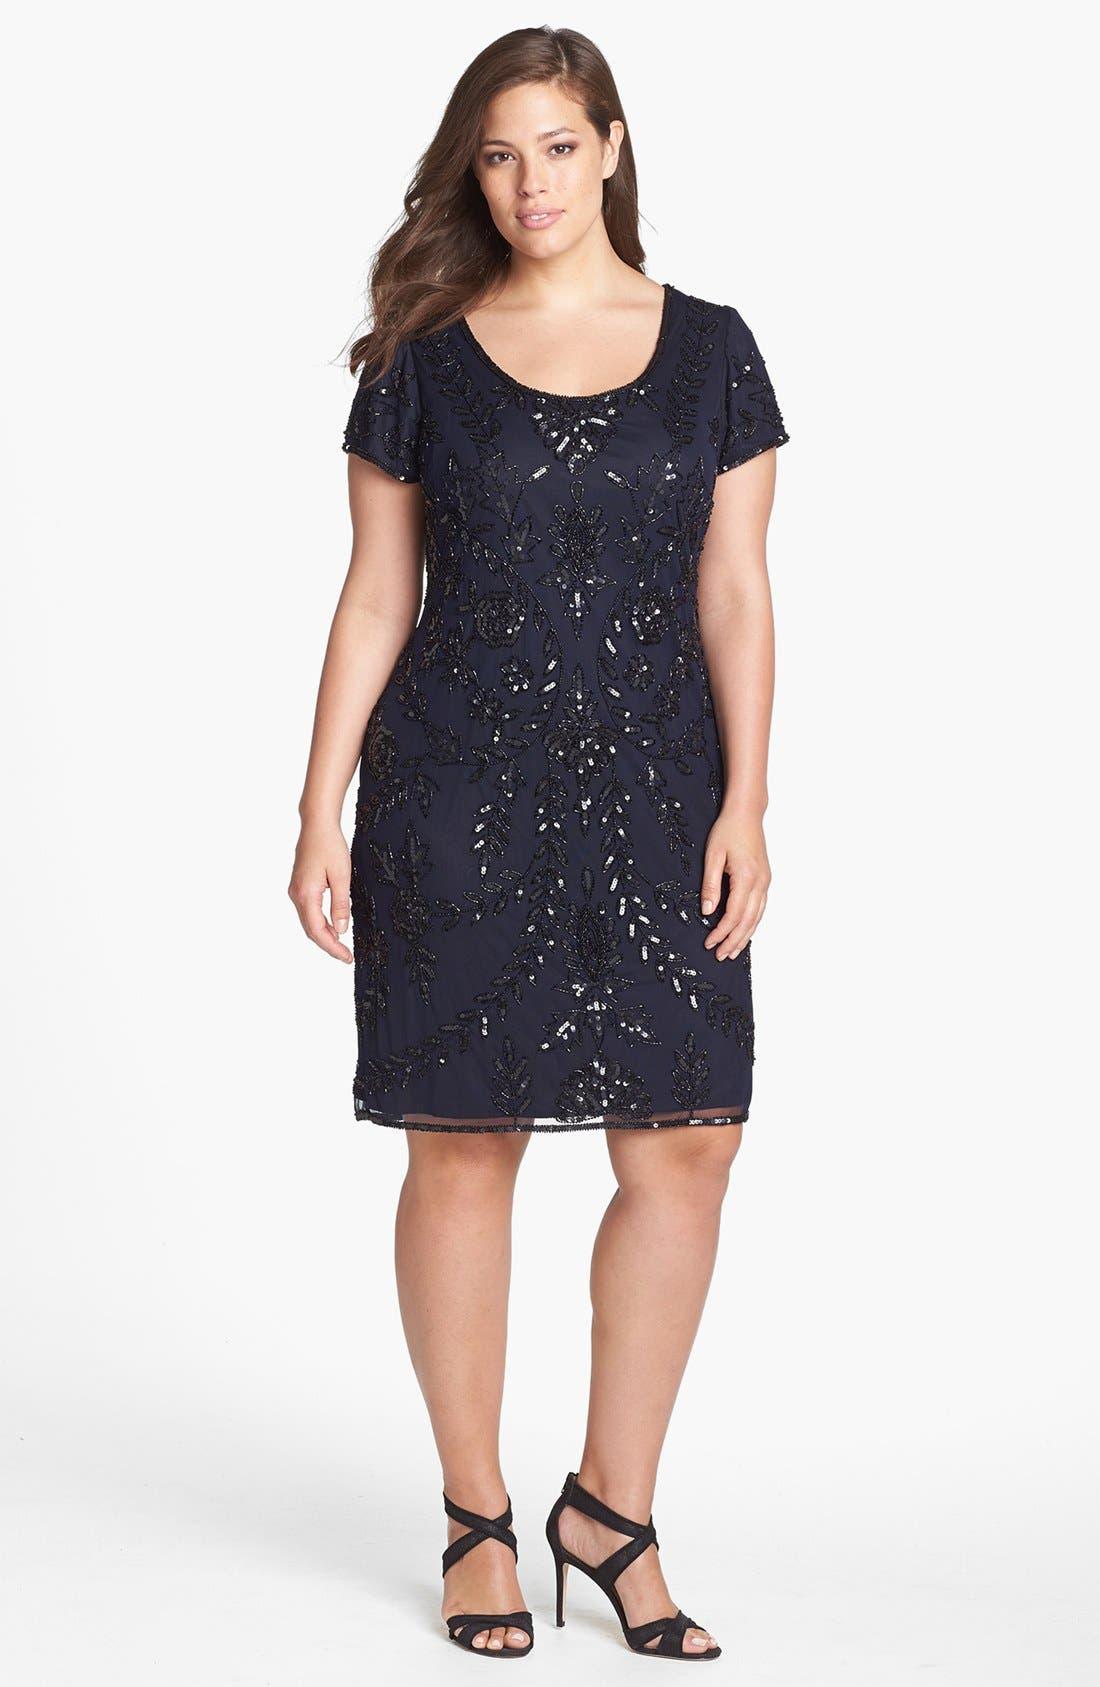 Alternate Image 1 Selected - Pisarro Nights Beaded Mesh Dress (Plus Size)